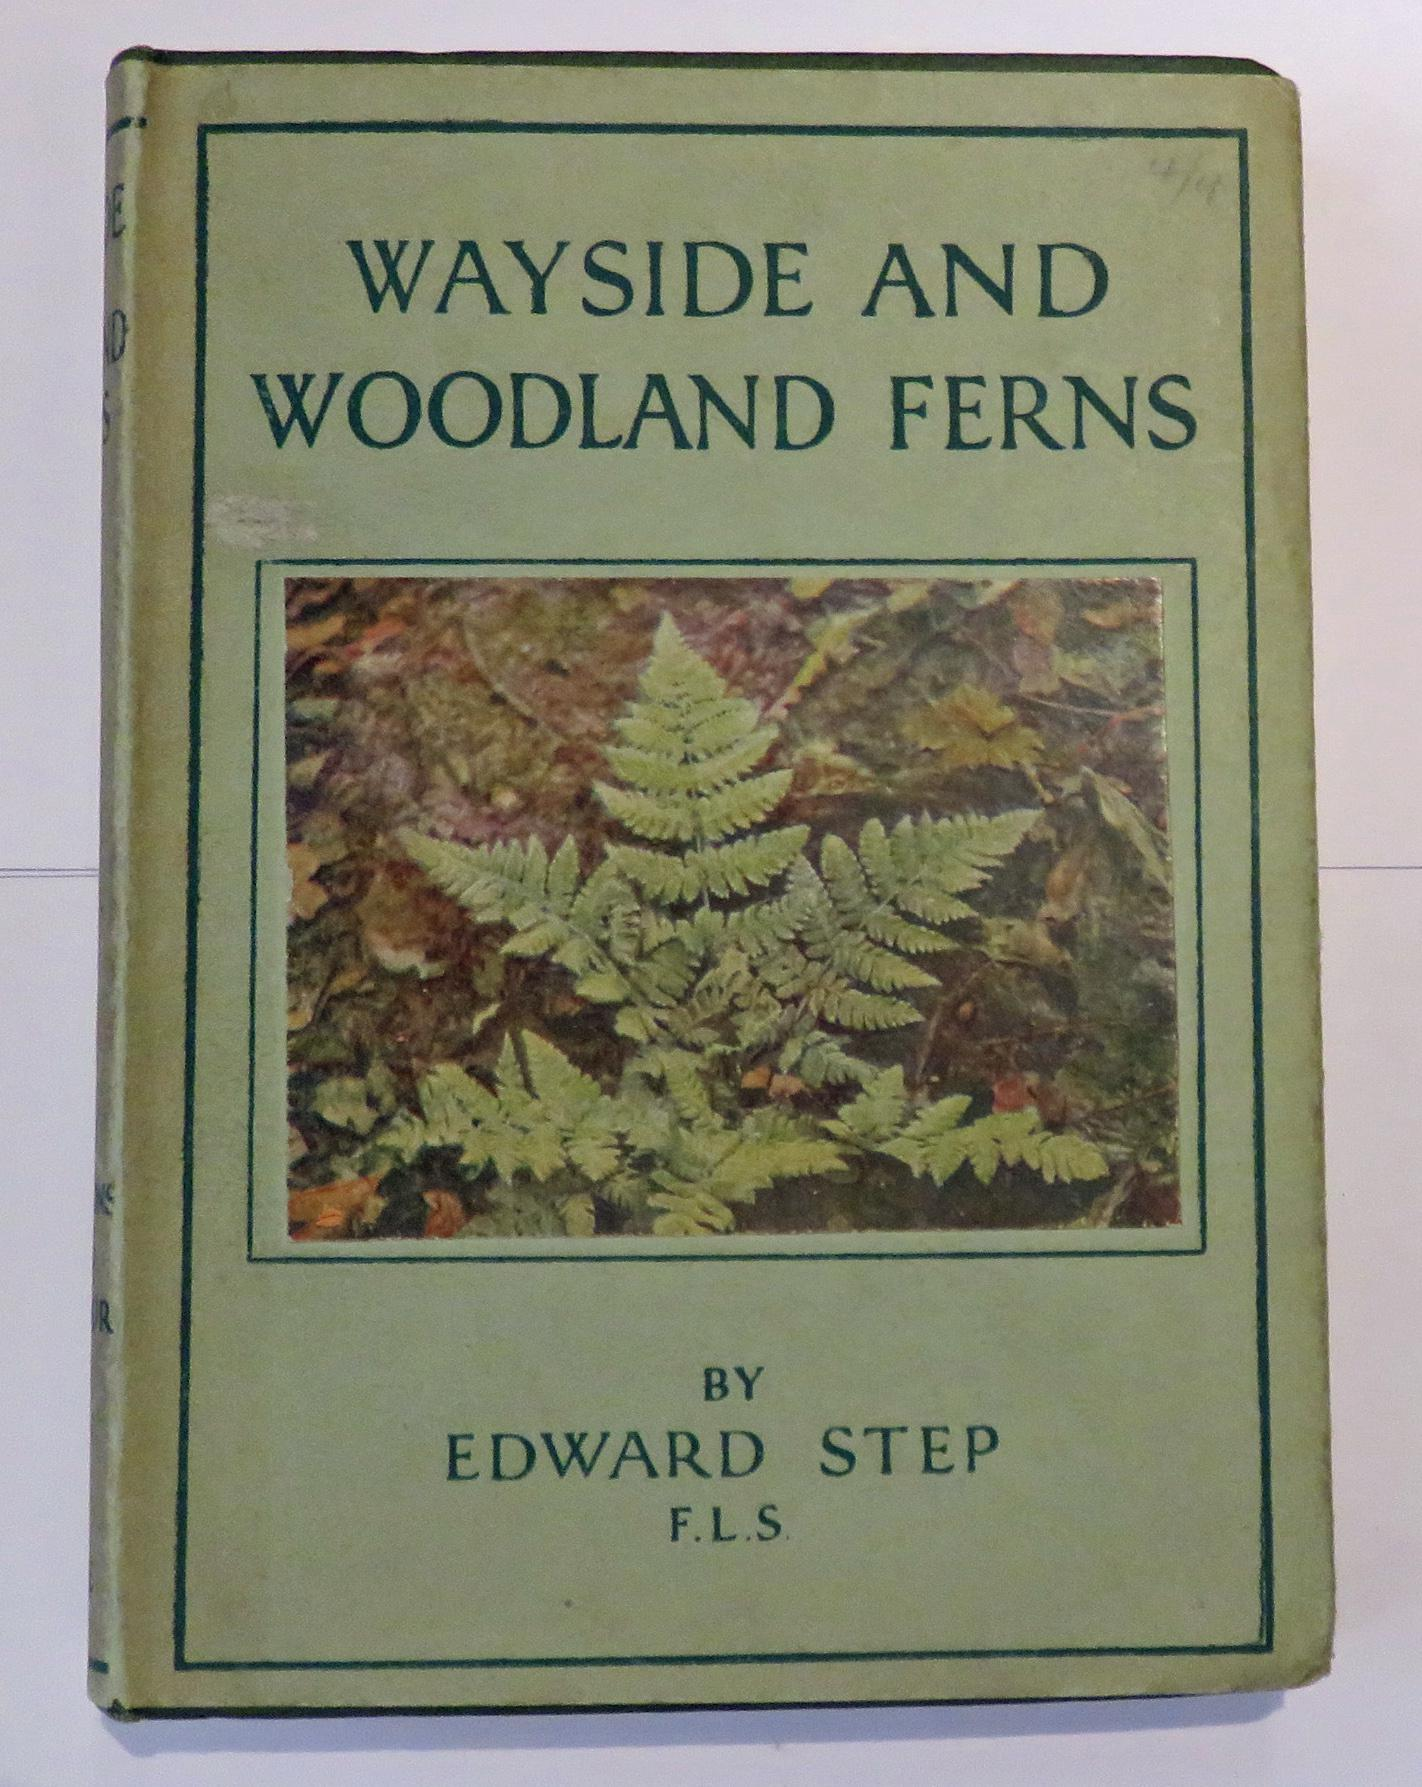 Wayside and Woodland Series Ferns